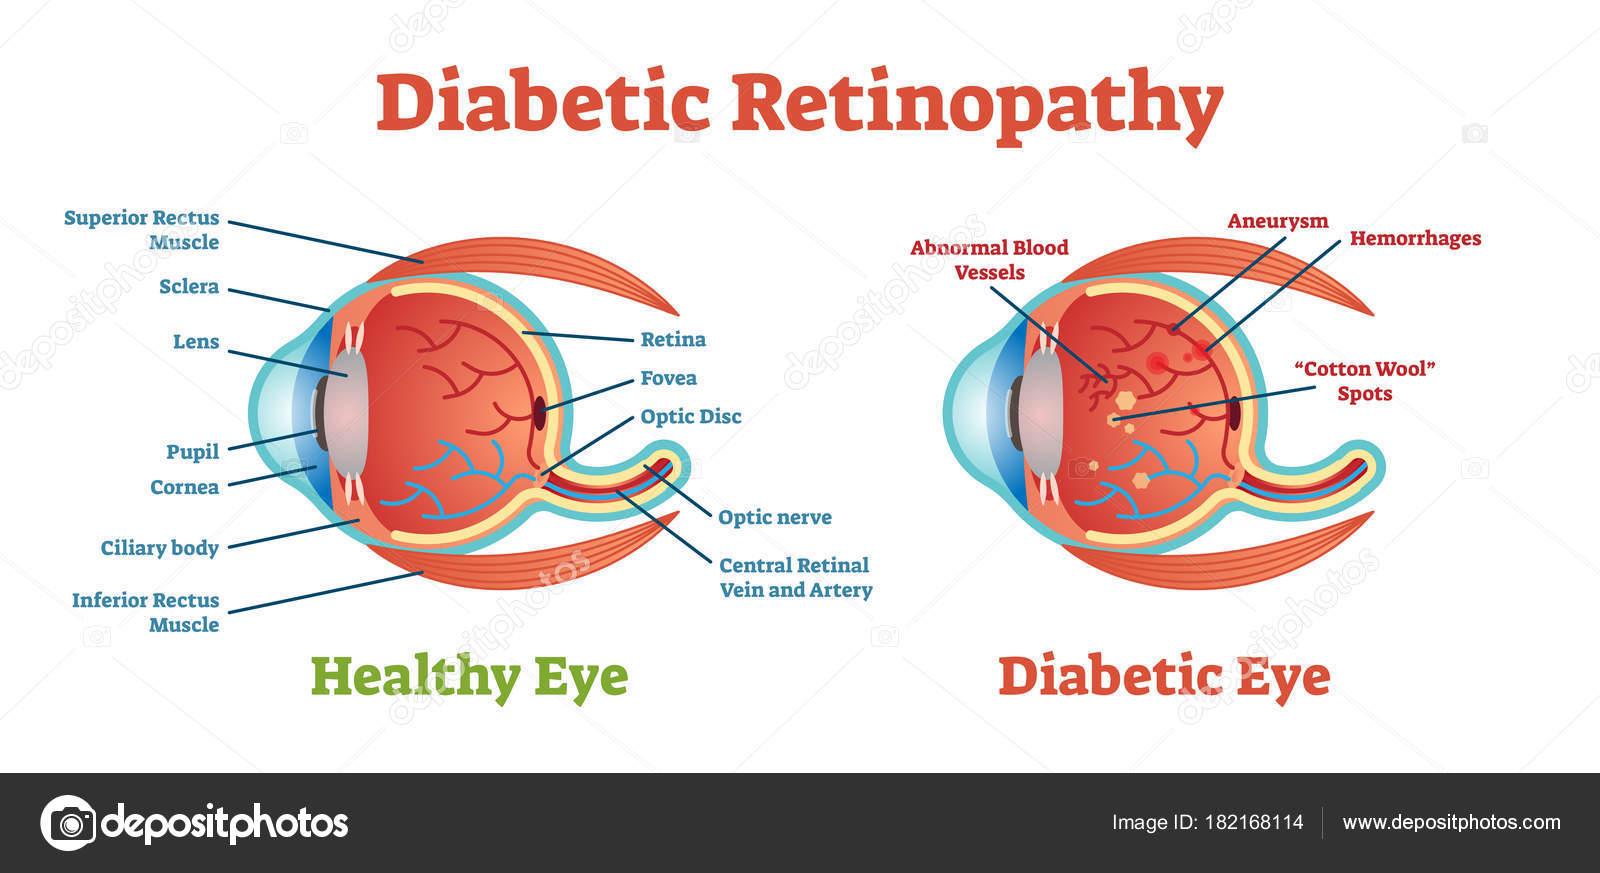 Diabetic Retinopathy vector illustration diagram, anatomical scheme ...